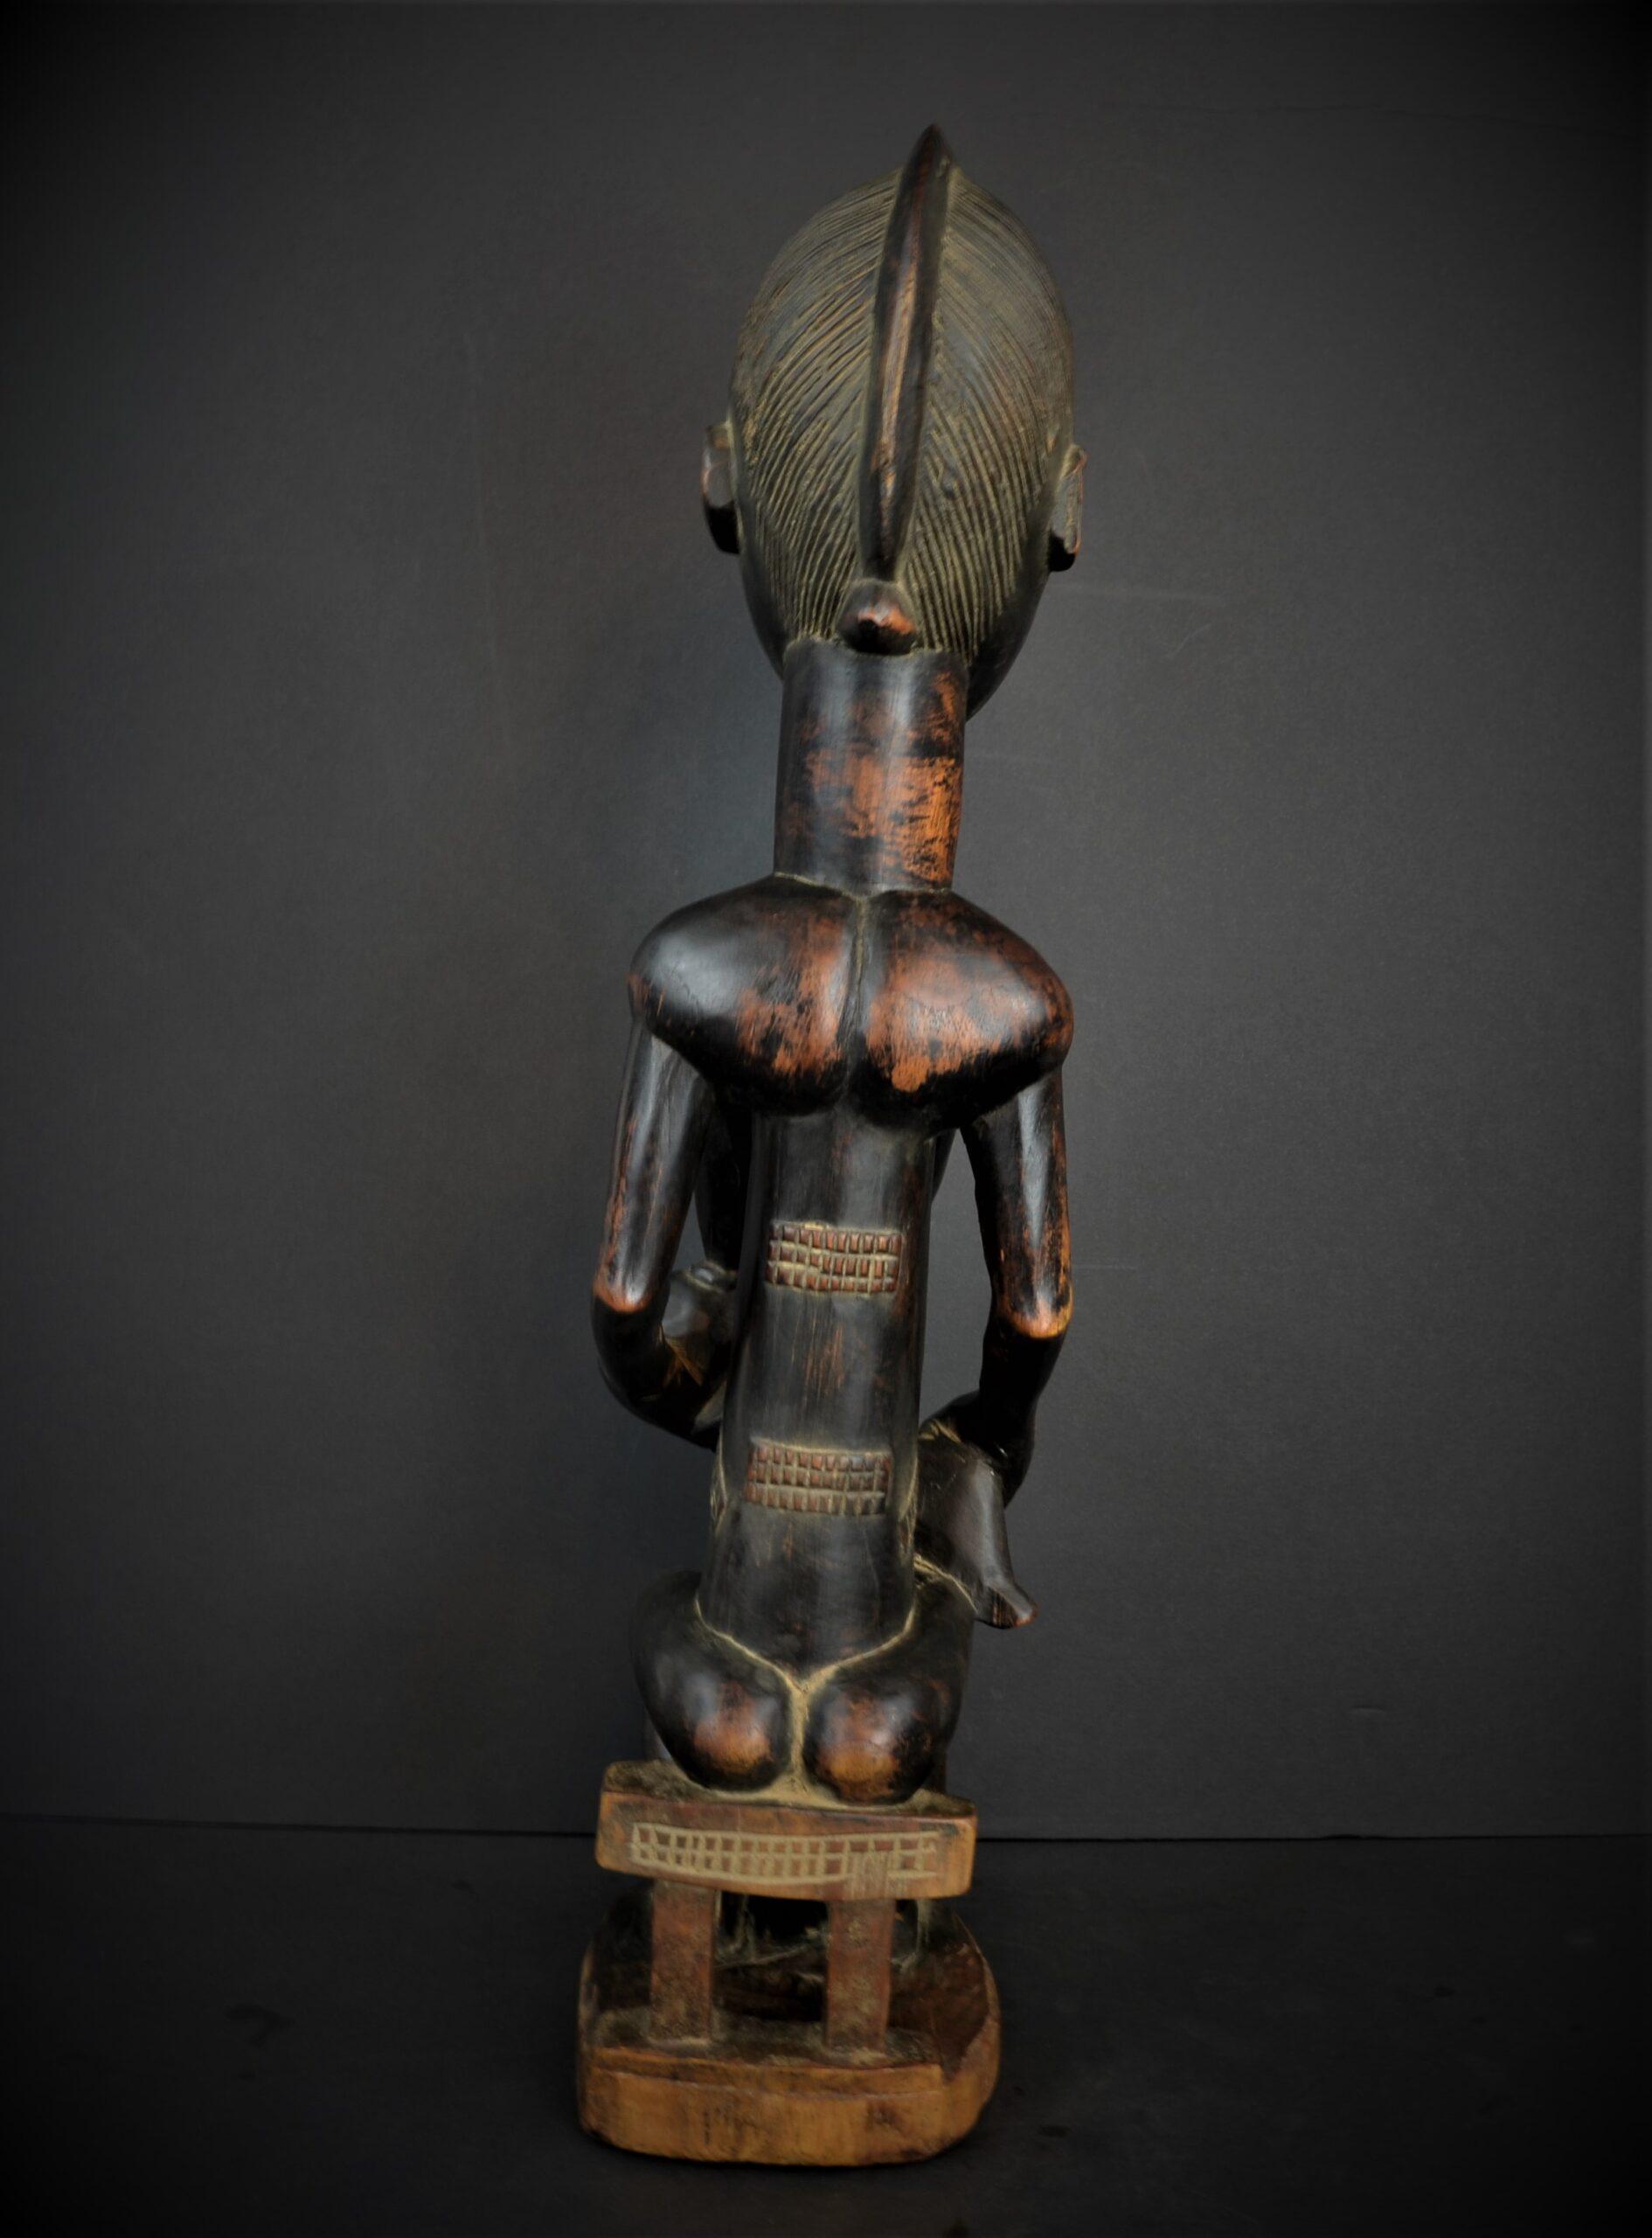 Baoule enfant assise 23